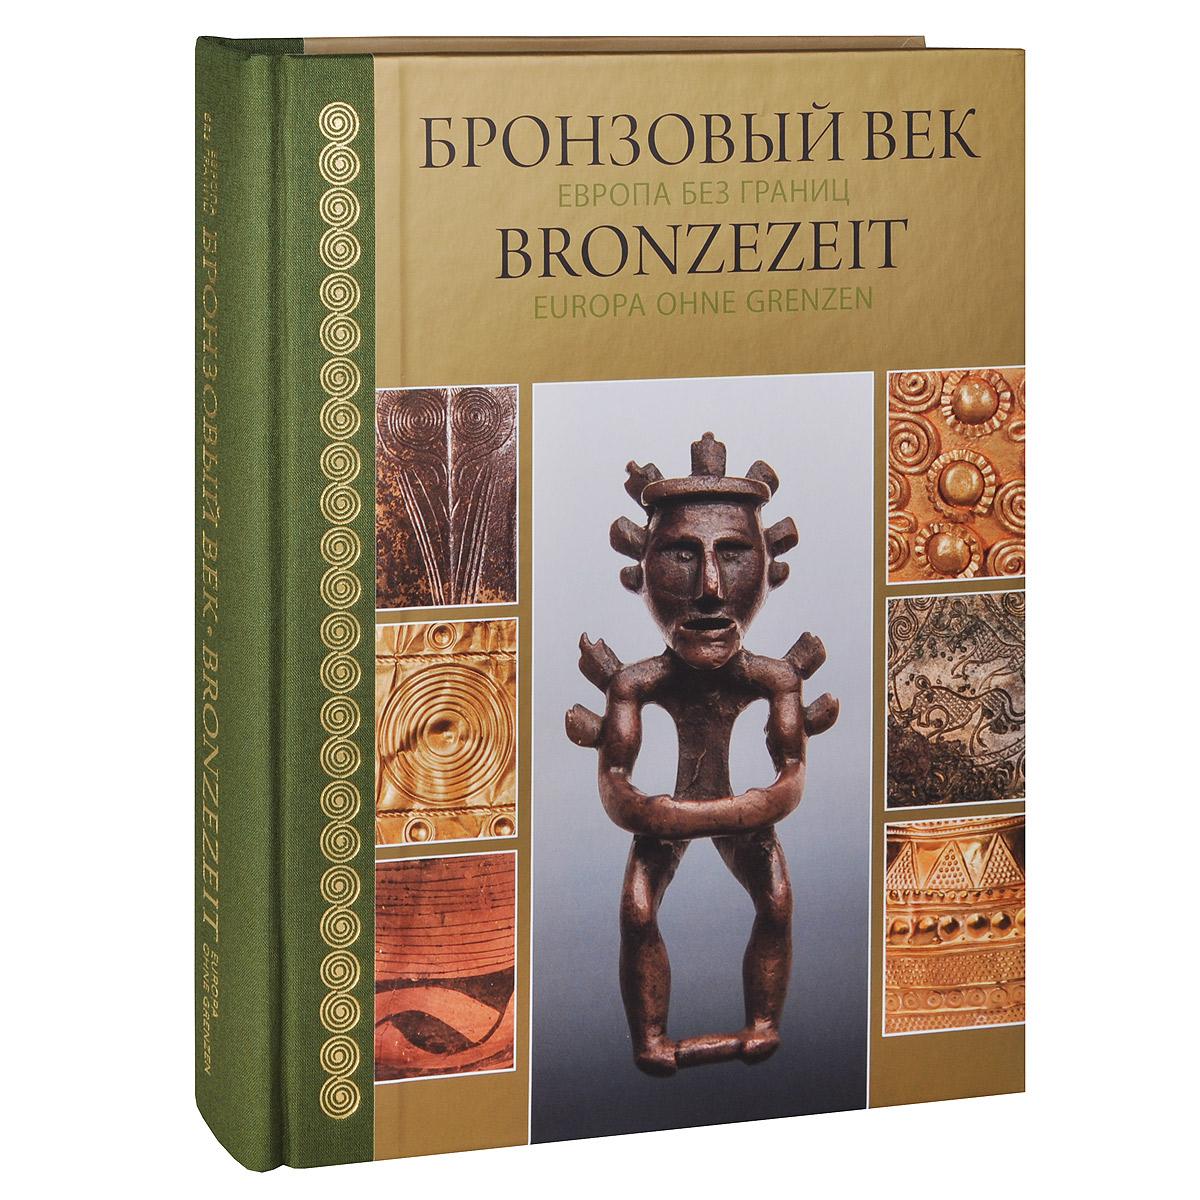 Бронзовый век. Европа без границ / Bronzezeit: Europa ohne Grenzen гарнитура dialog hs 17bt black